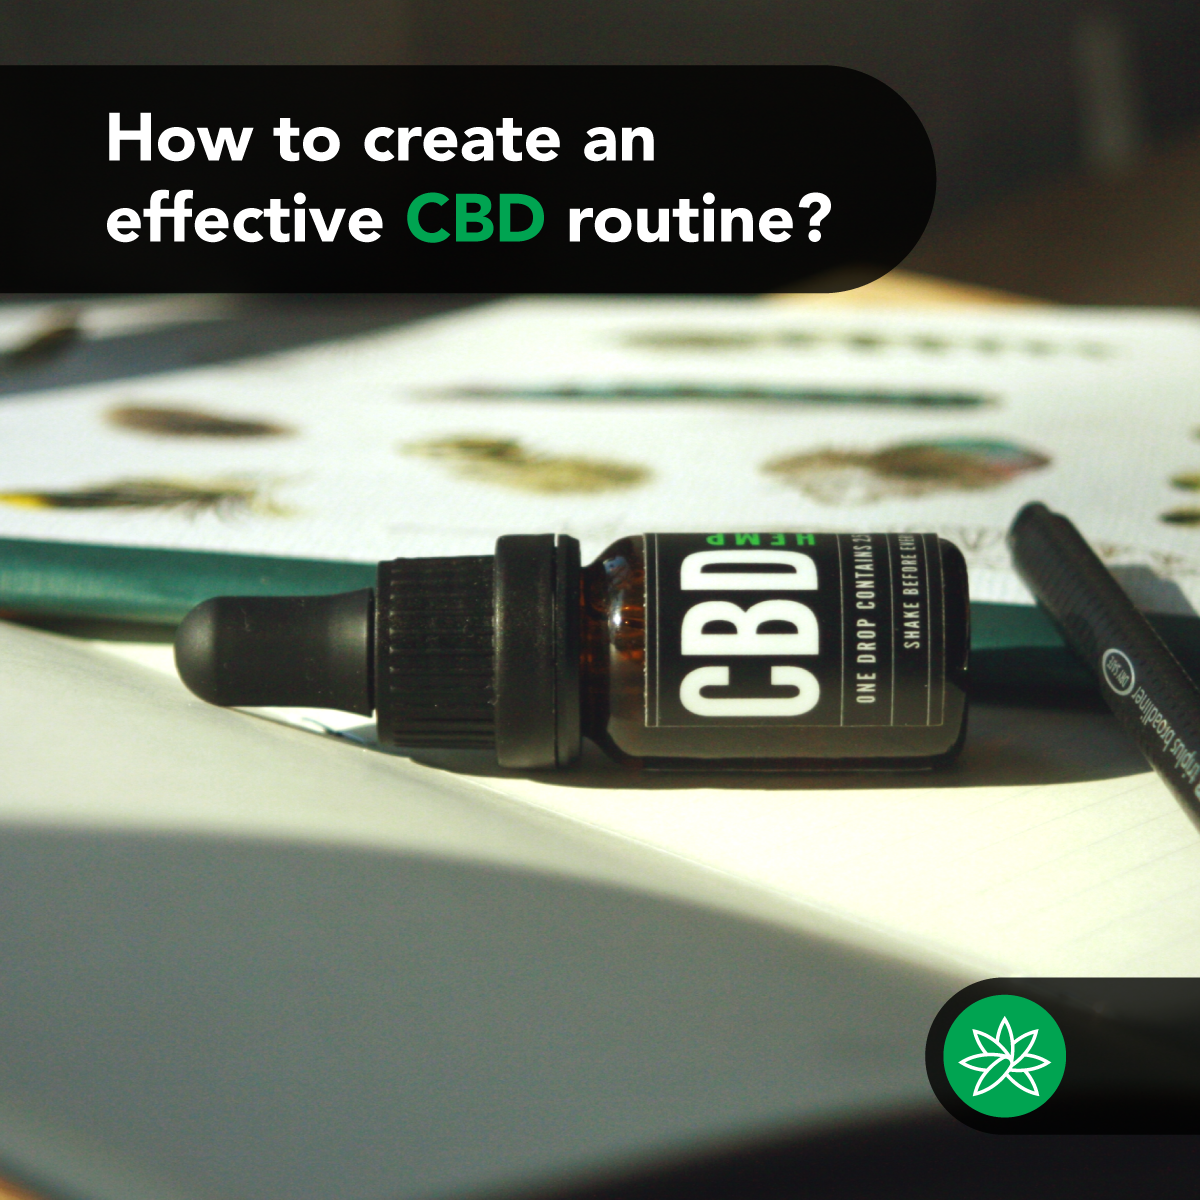 CBD routine